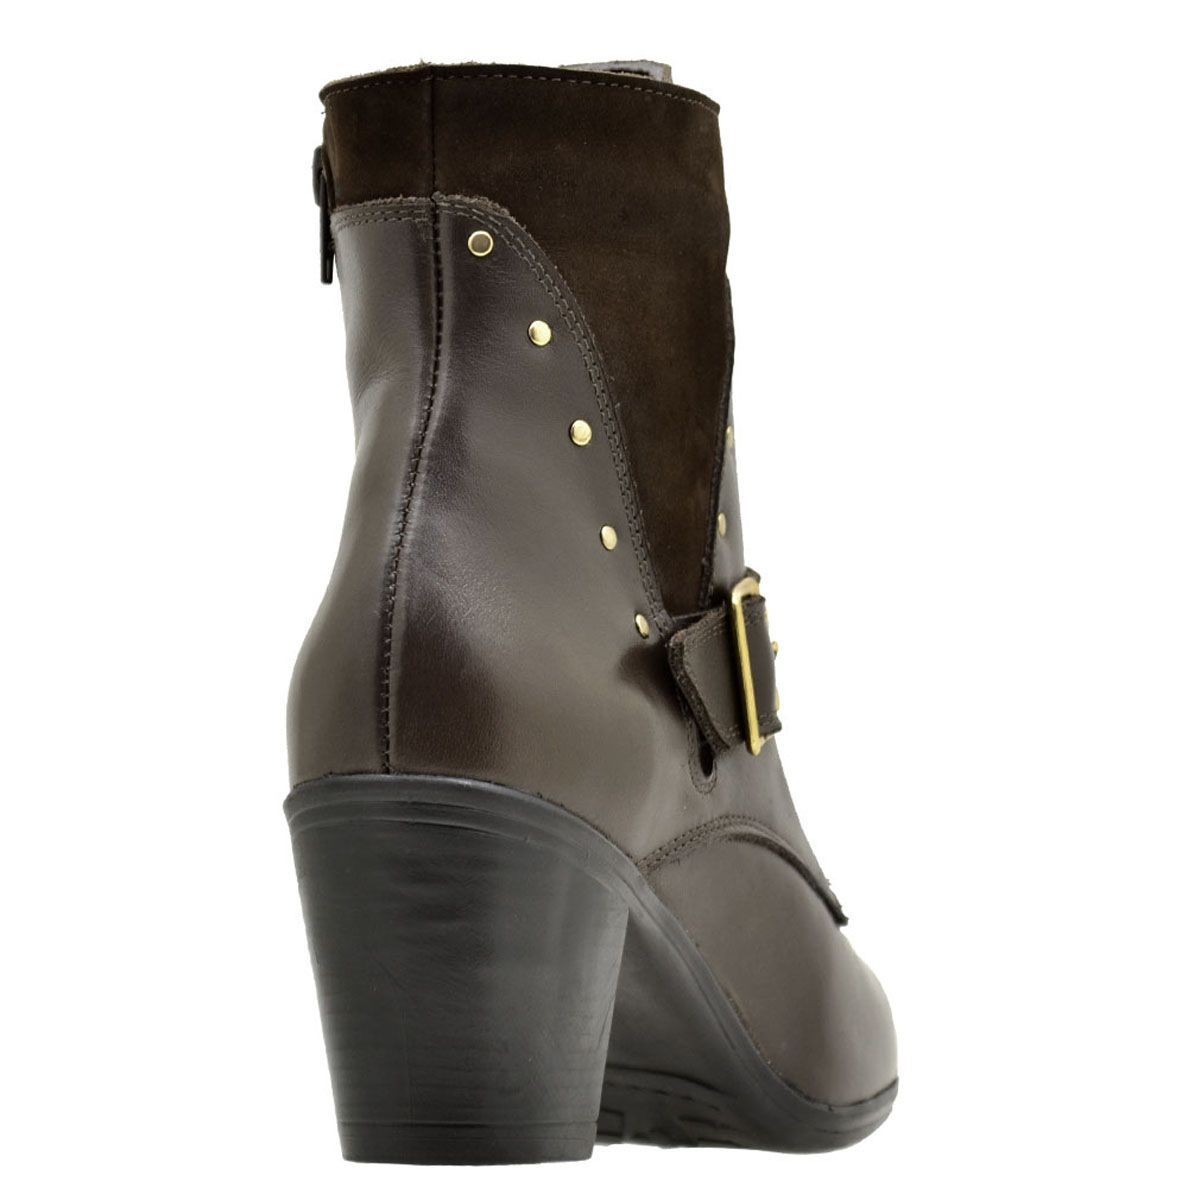 Coturno feminino Atron Shoes de couro na cor café 9066